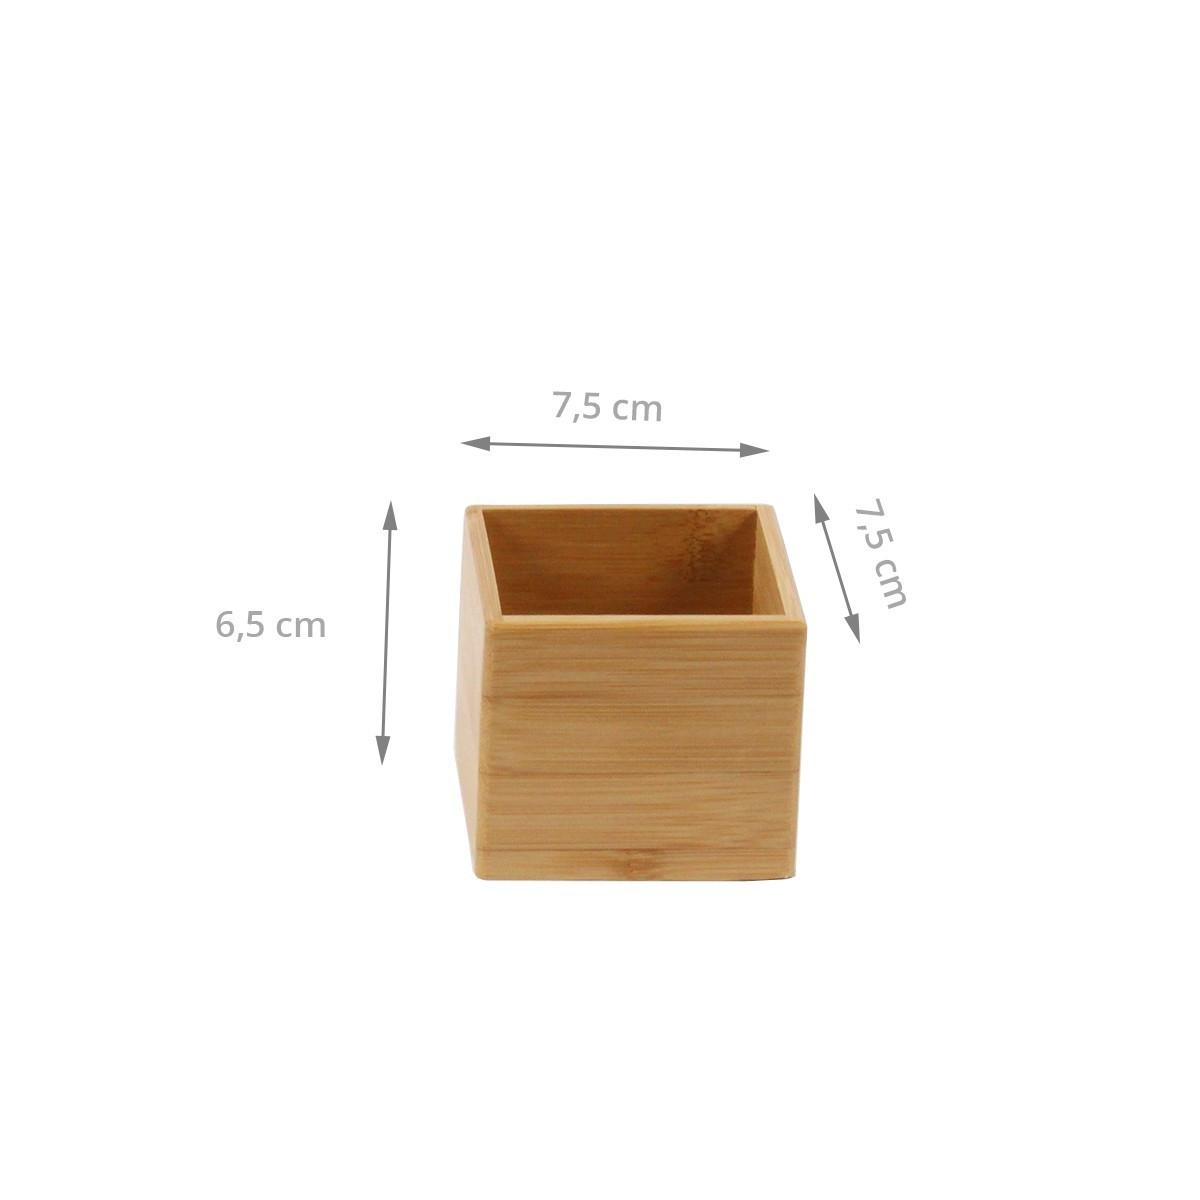 Petit bac carr bambou organisation tiroir for Organisateur tiroir cuisine